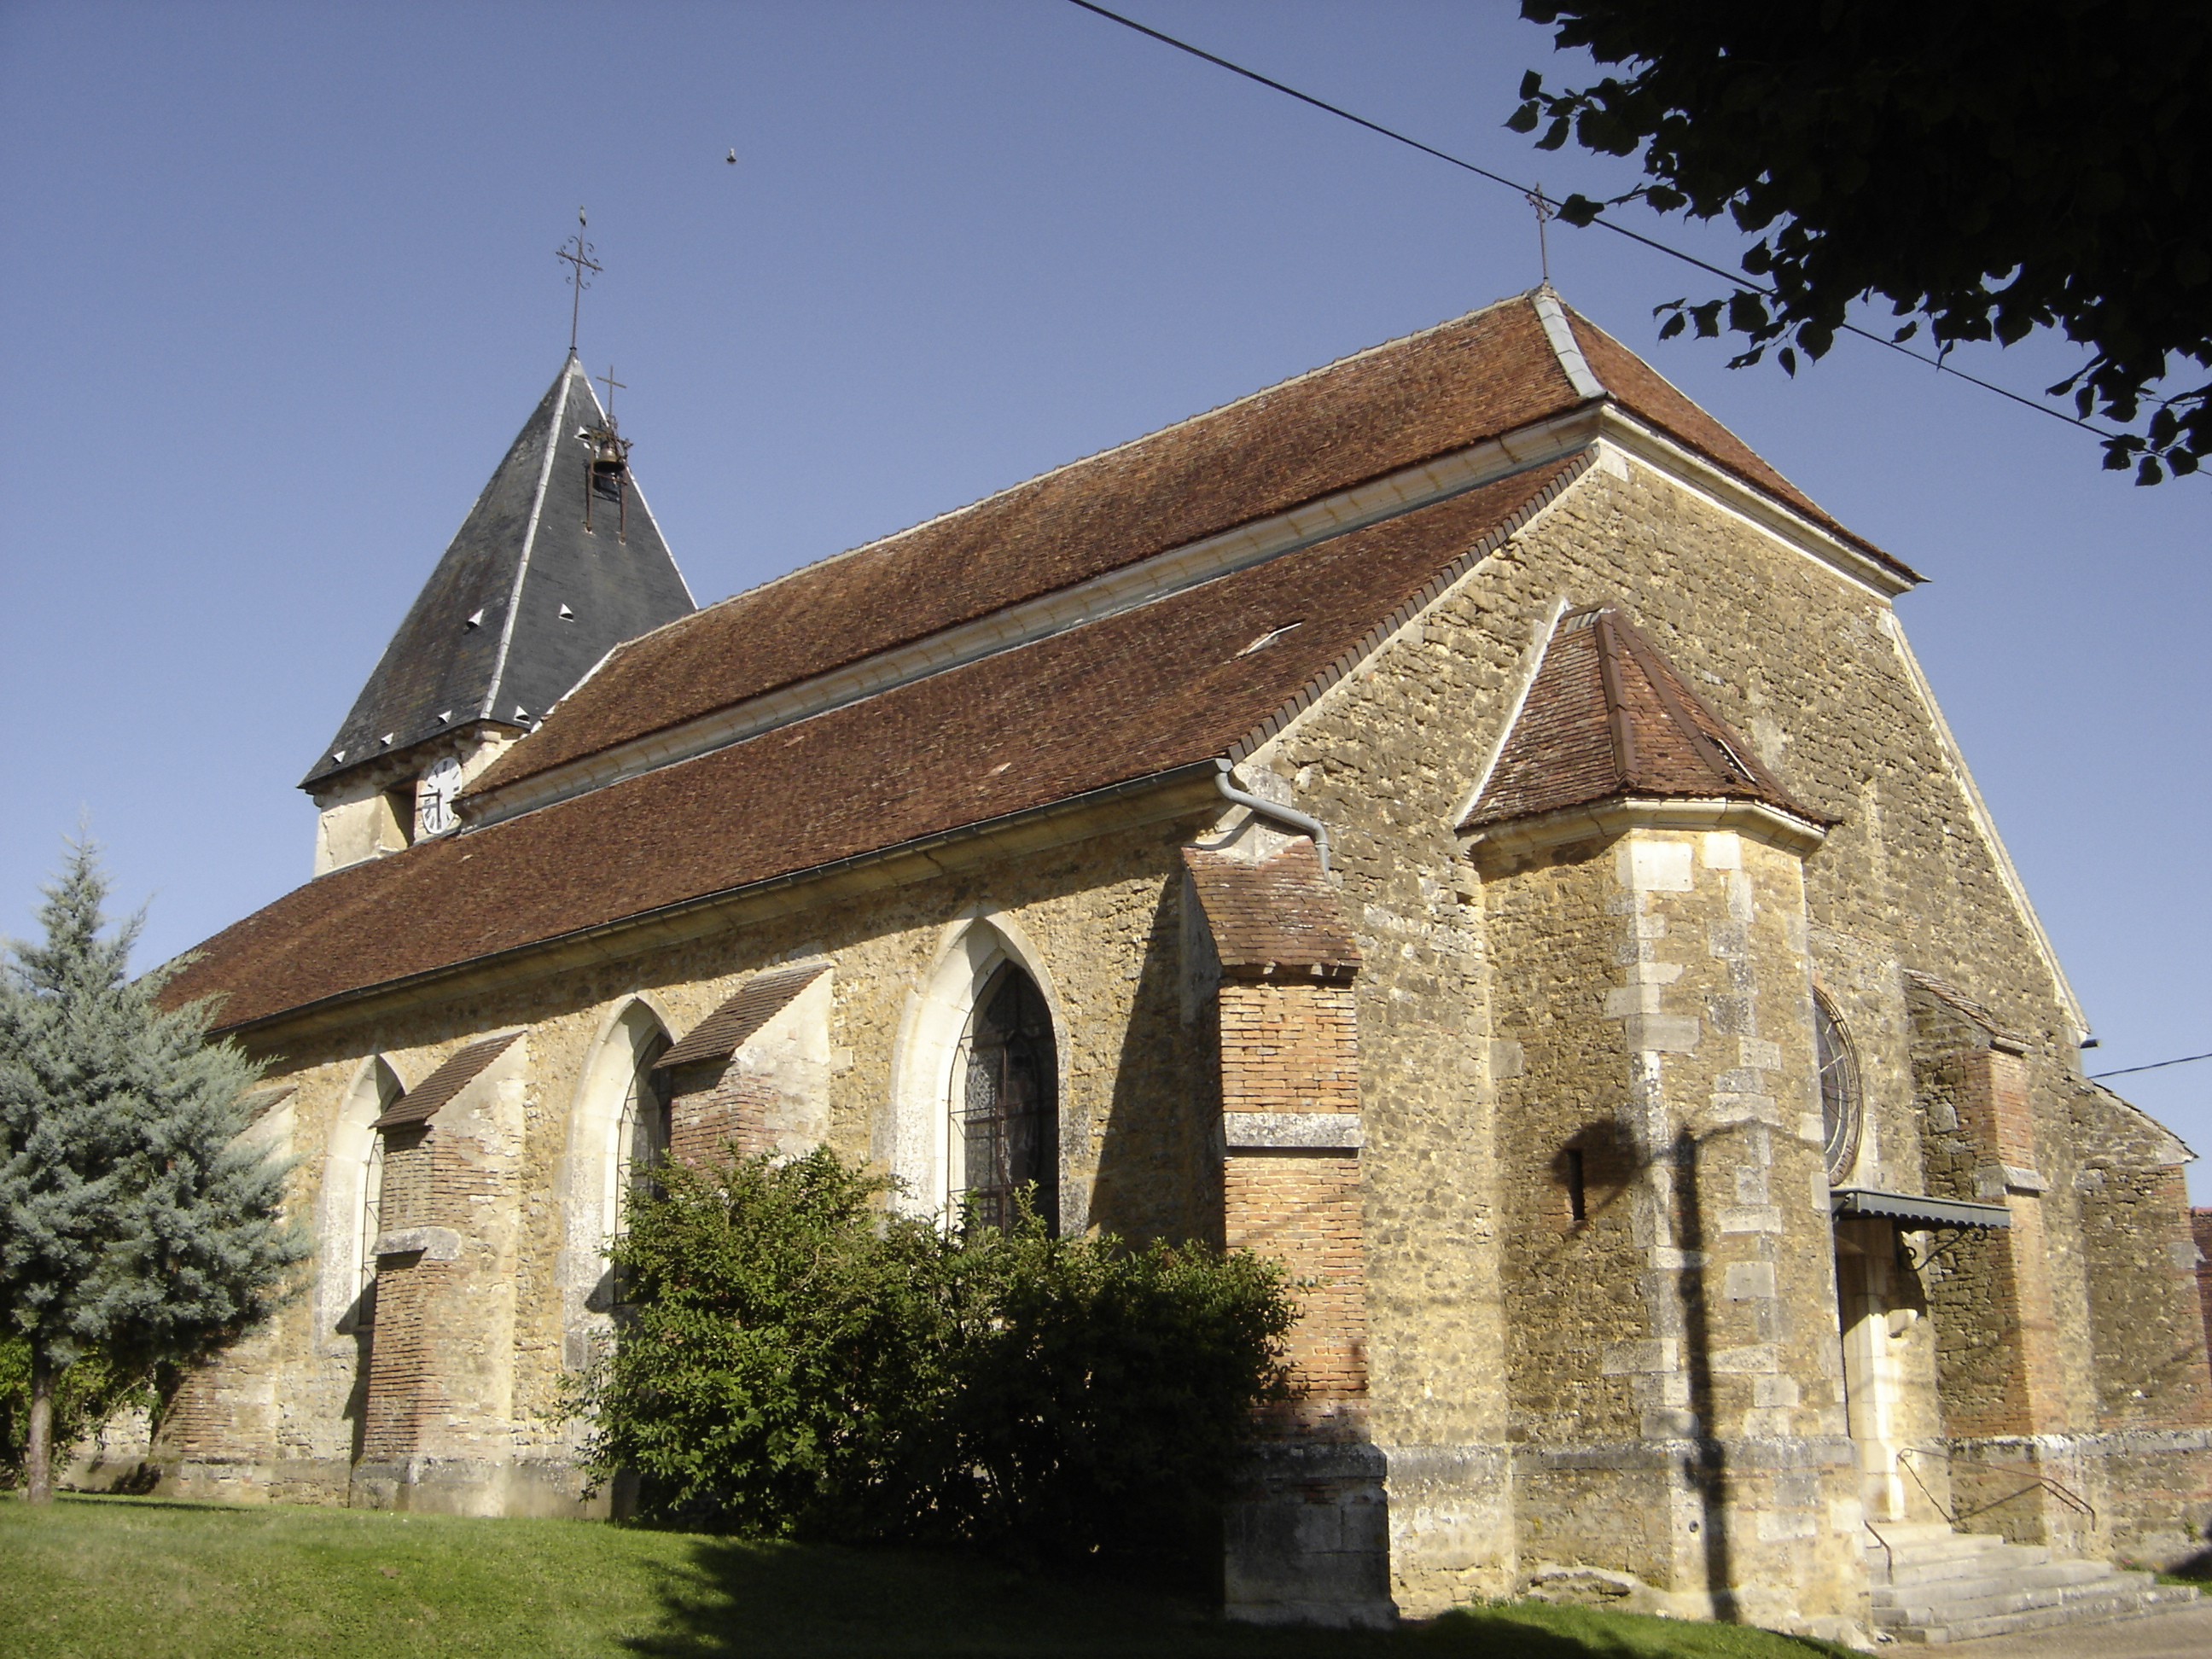 Marolles-lès-Bailly